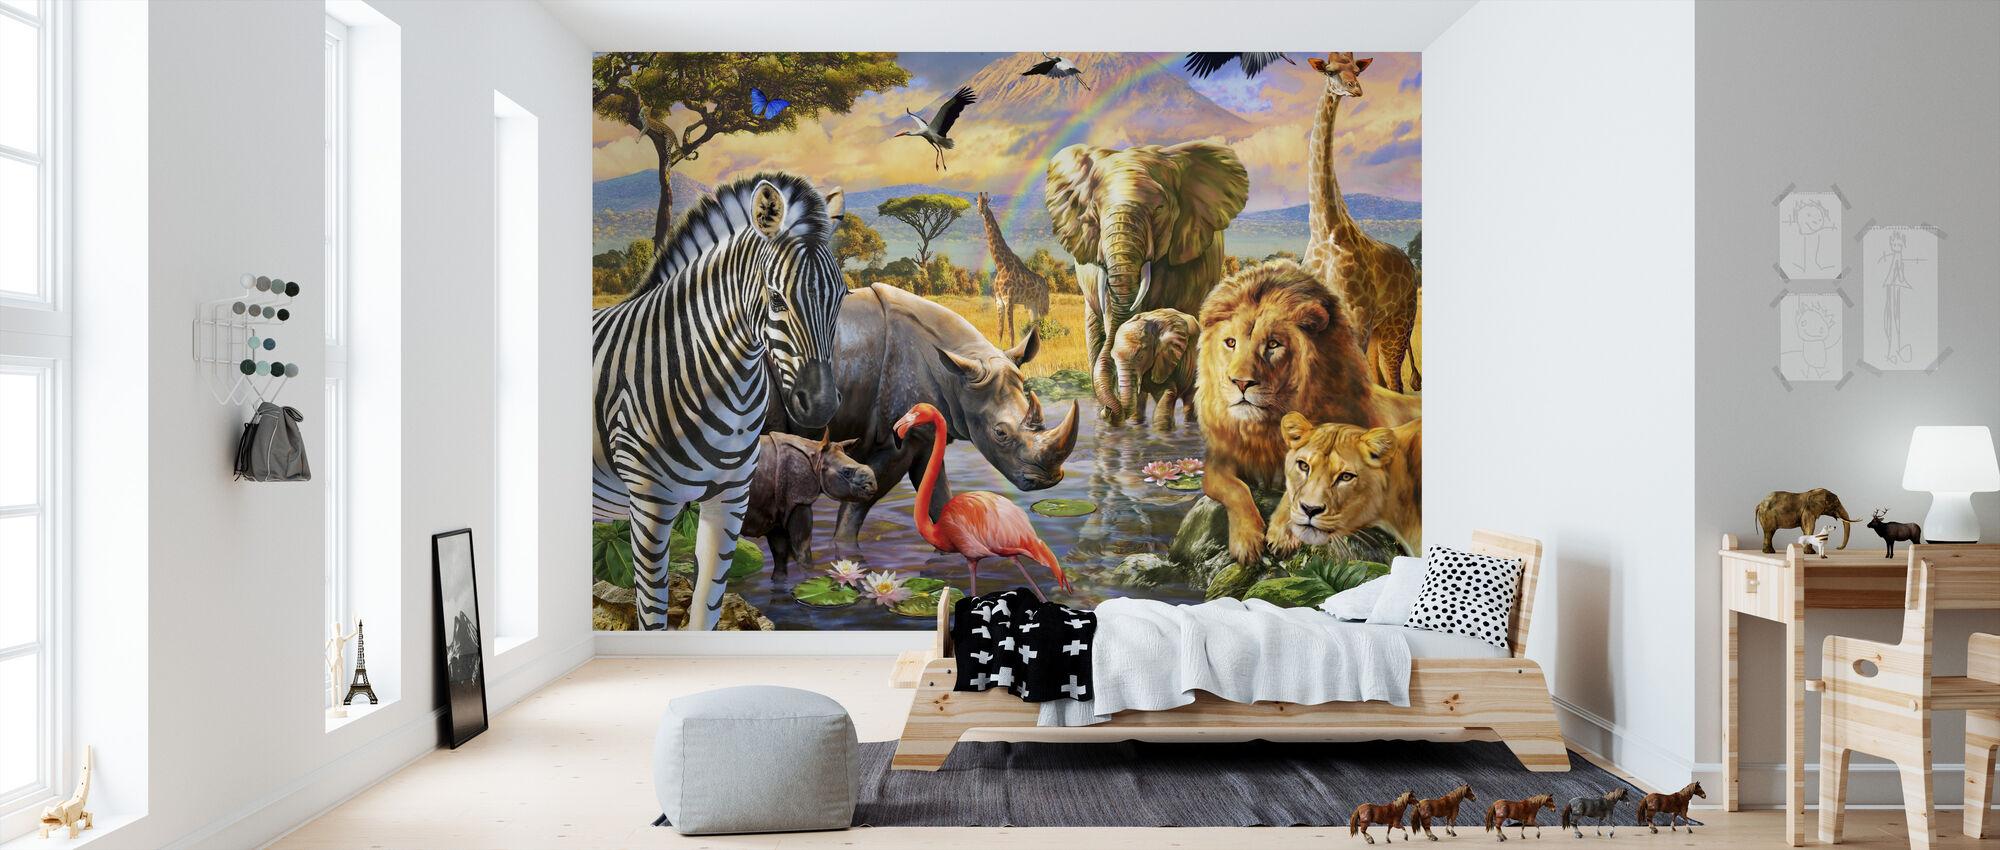 Savanna Watering Hole - Wallpaper - Kids Room